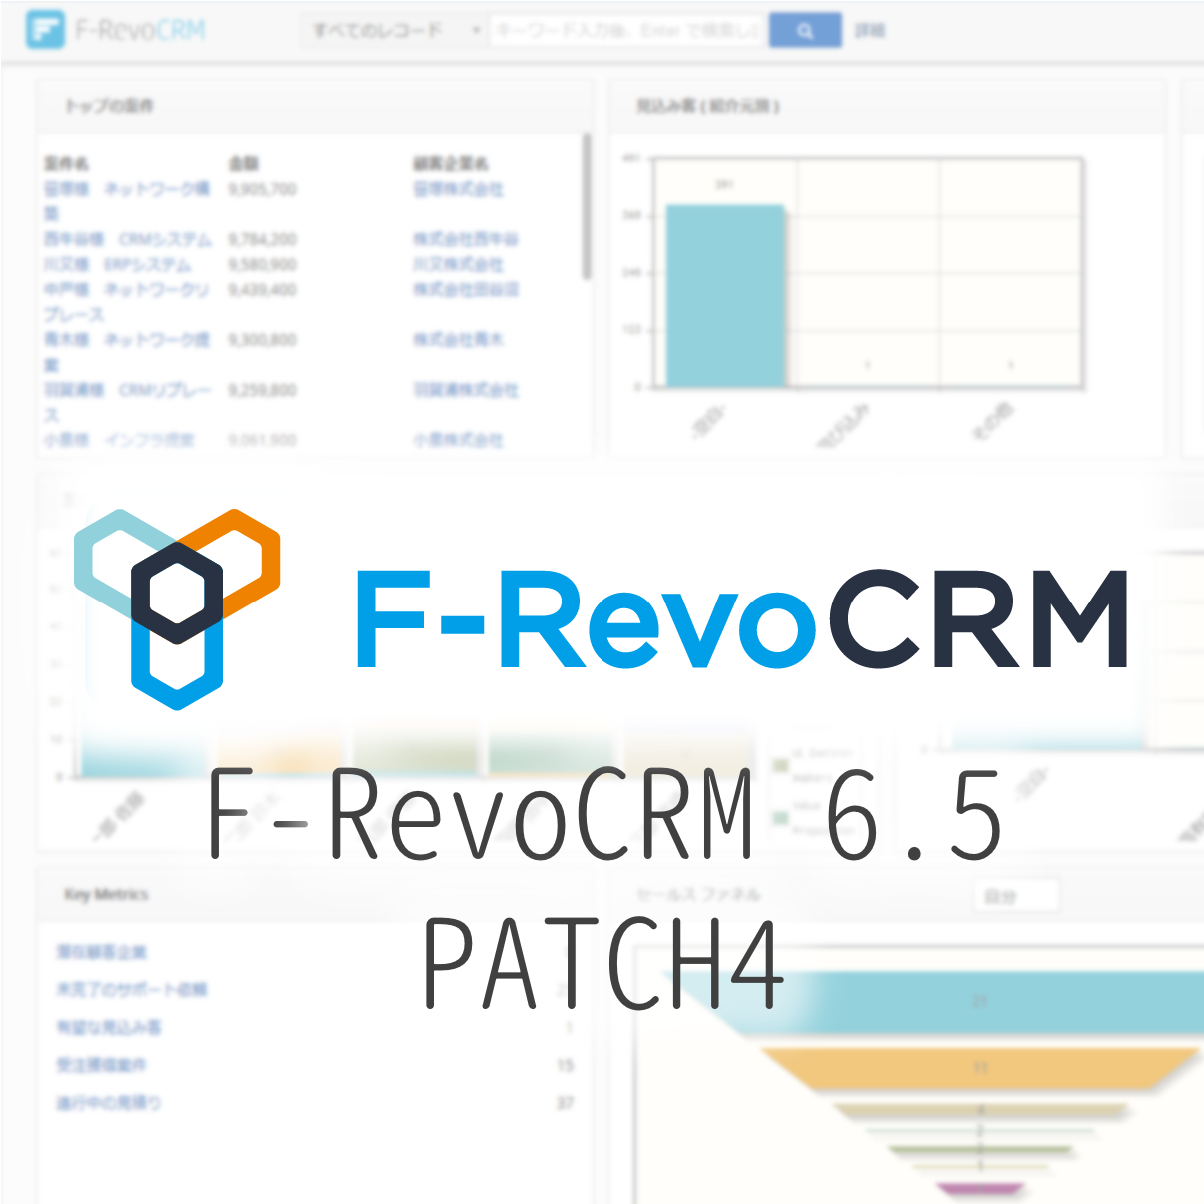 F-RevoCRM6.5 Patch4